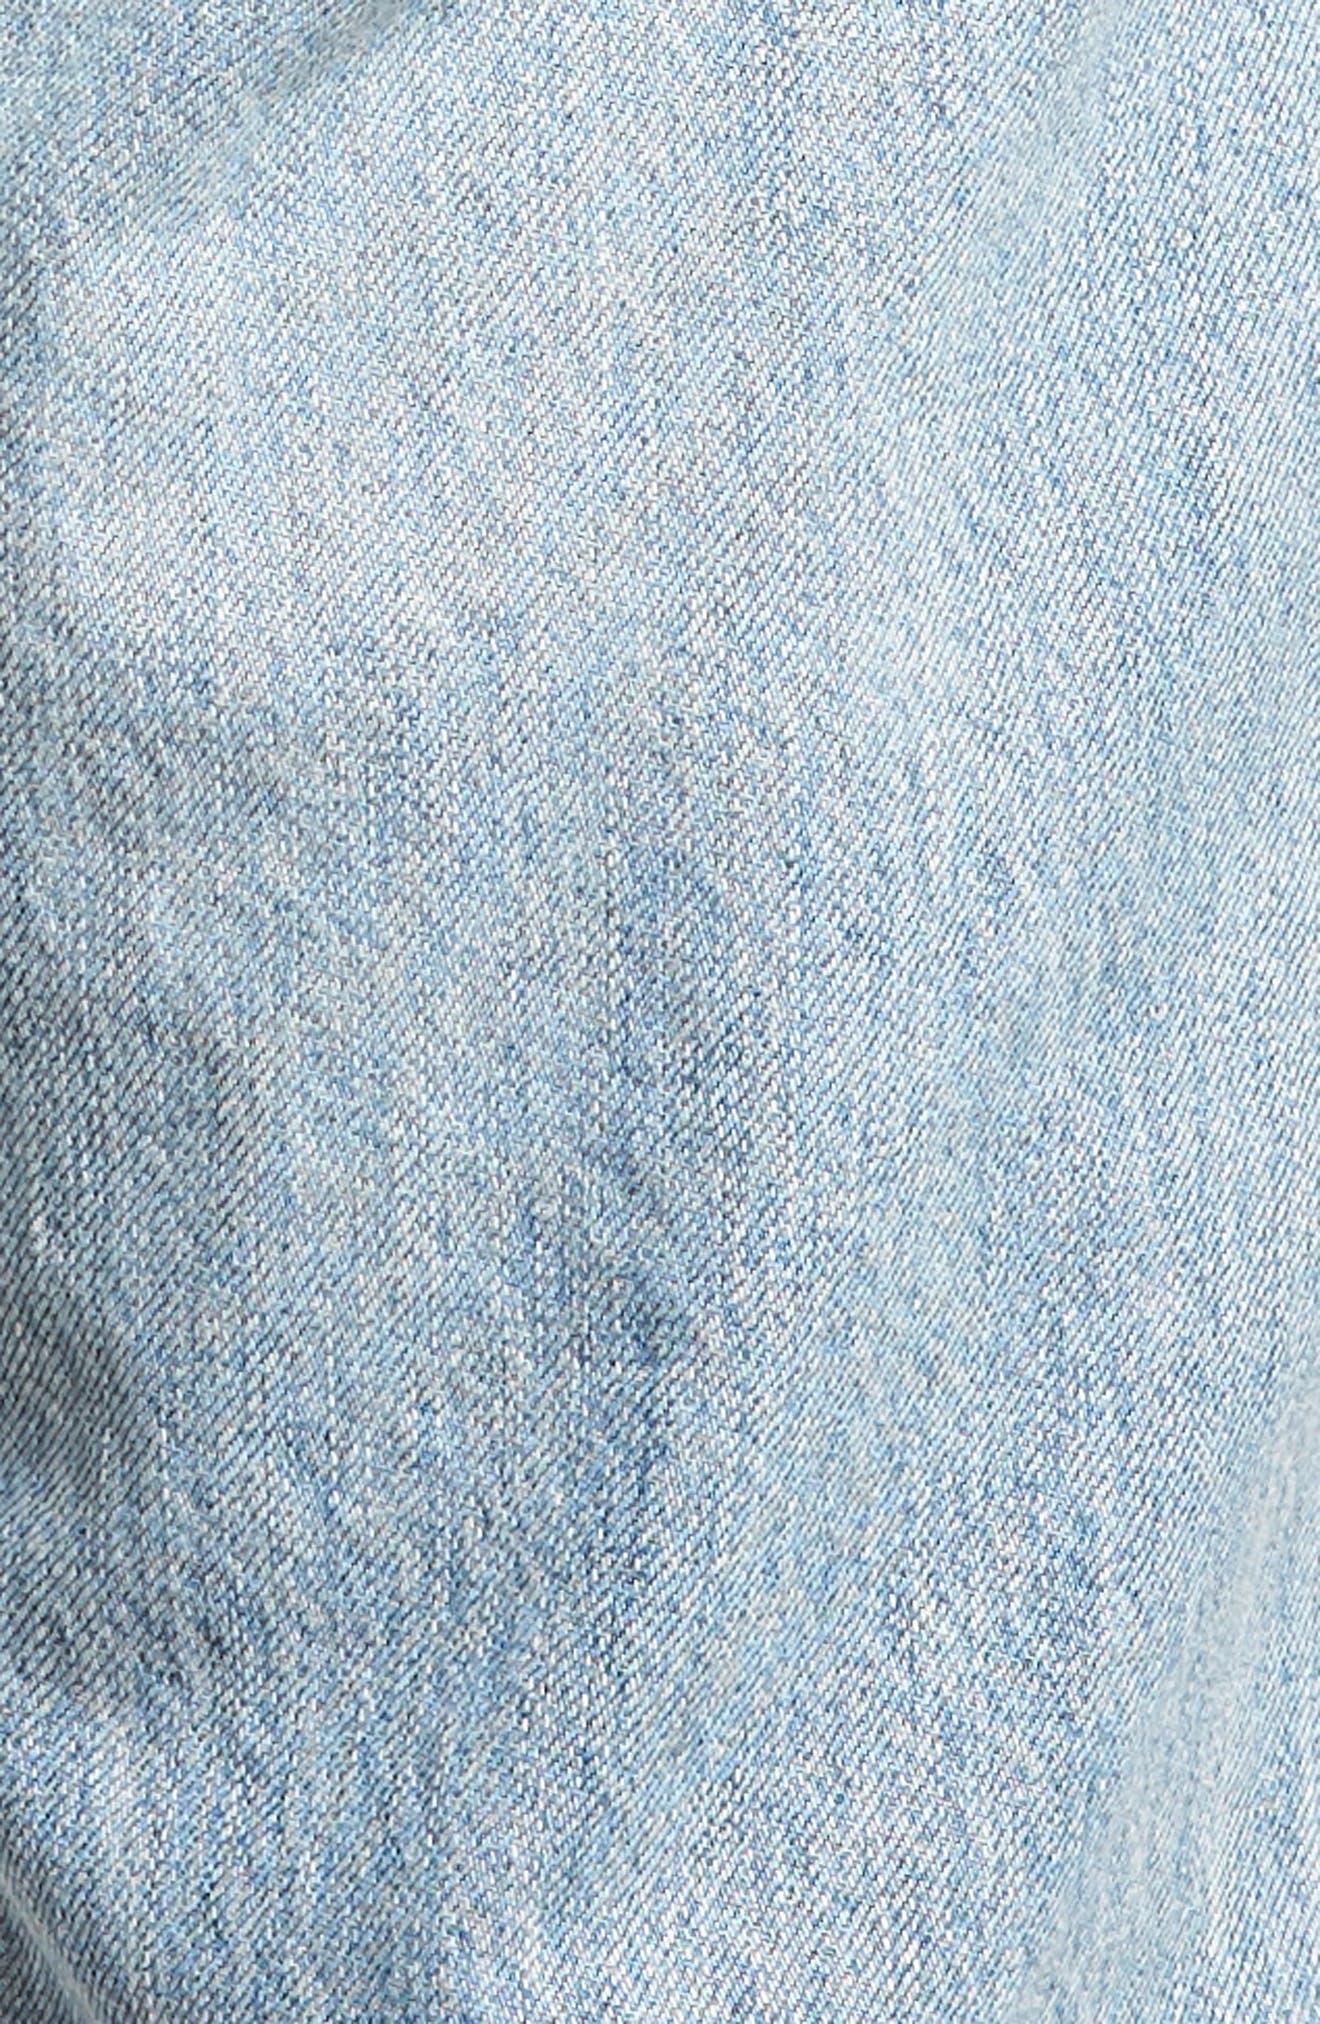 Tellis Slim Fit Jeans,                             Alternate thumbnail 4, color,                             23 Years Seafarer